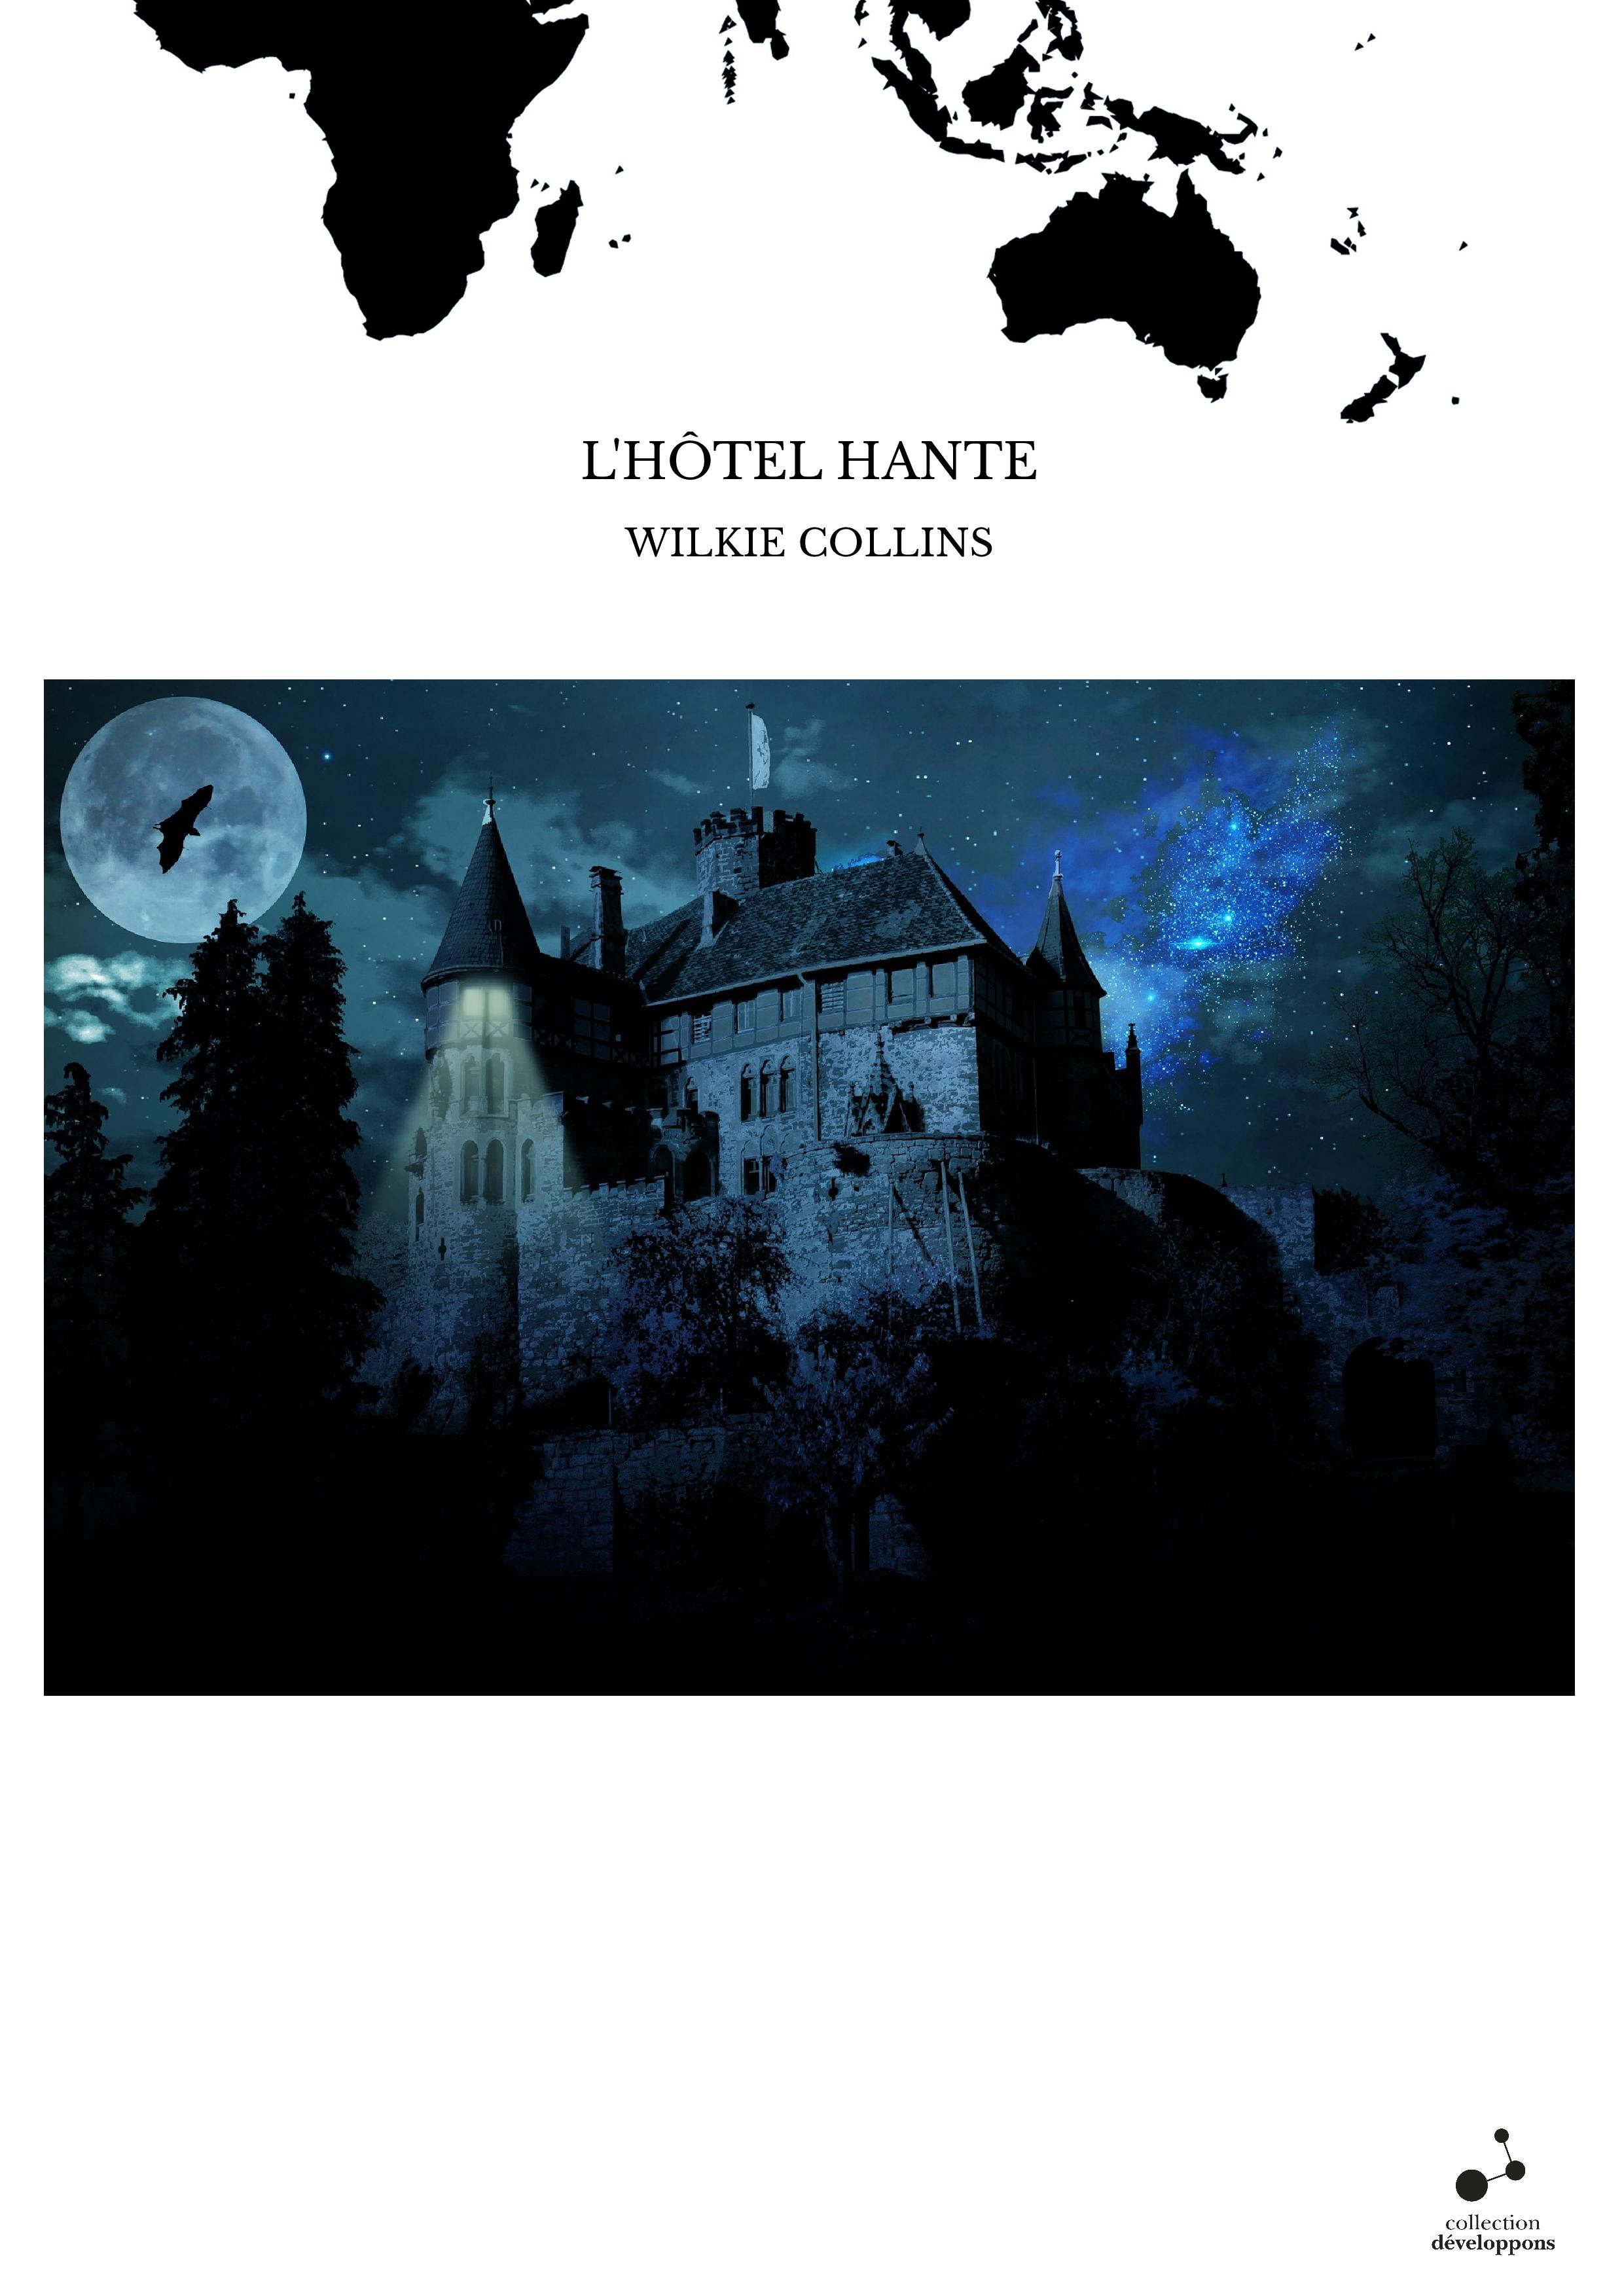 L'HÔTEL HANTE